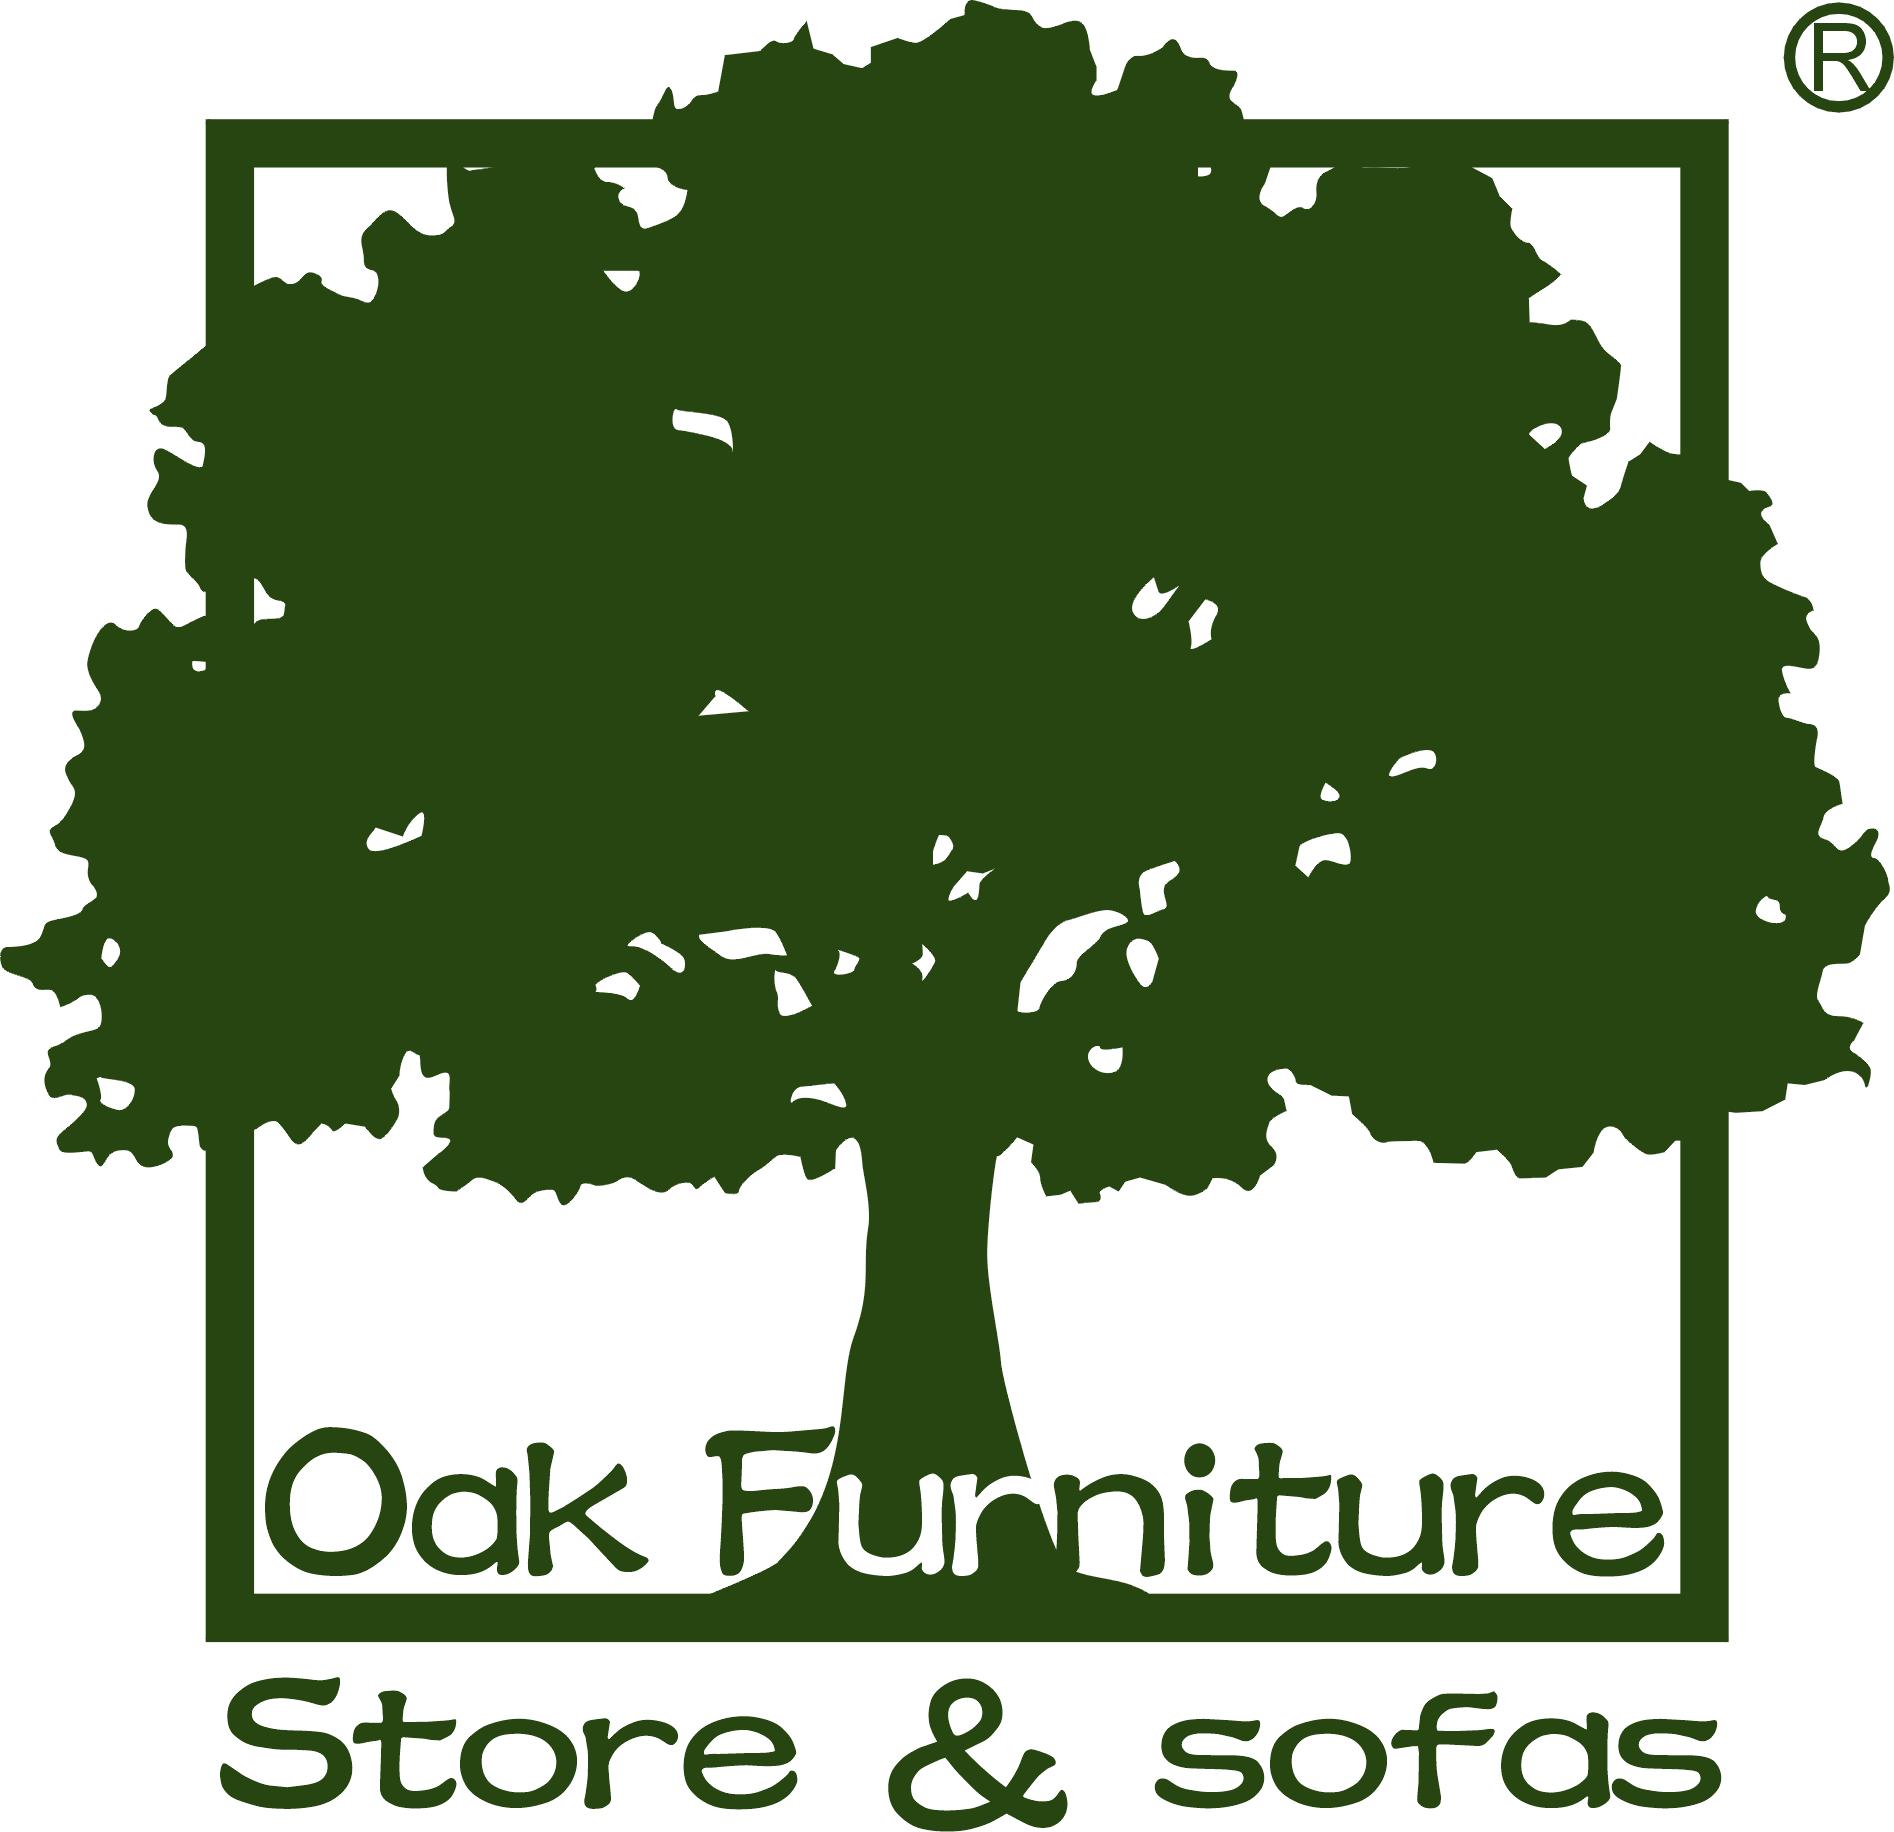 Read Oak Furniture Store & Sofas Reviews